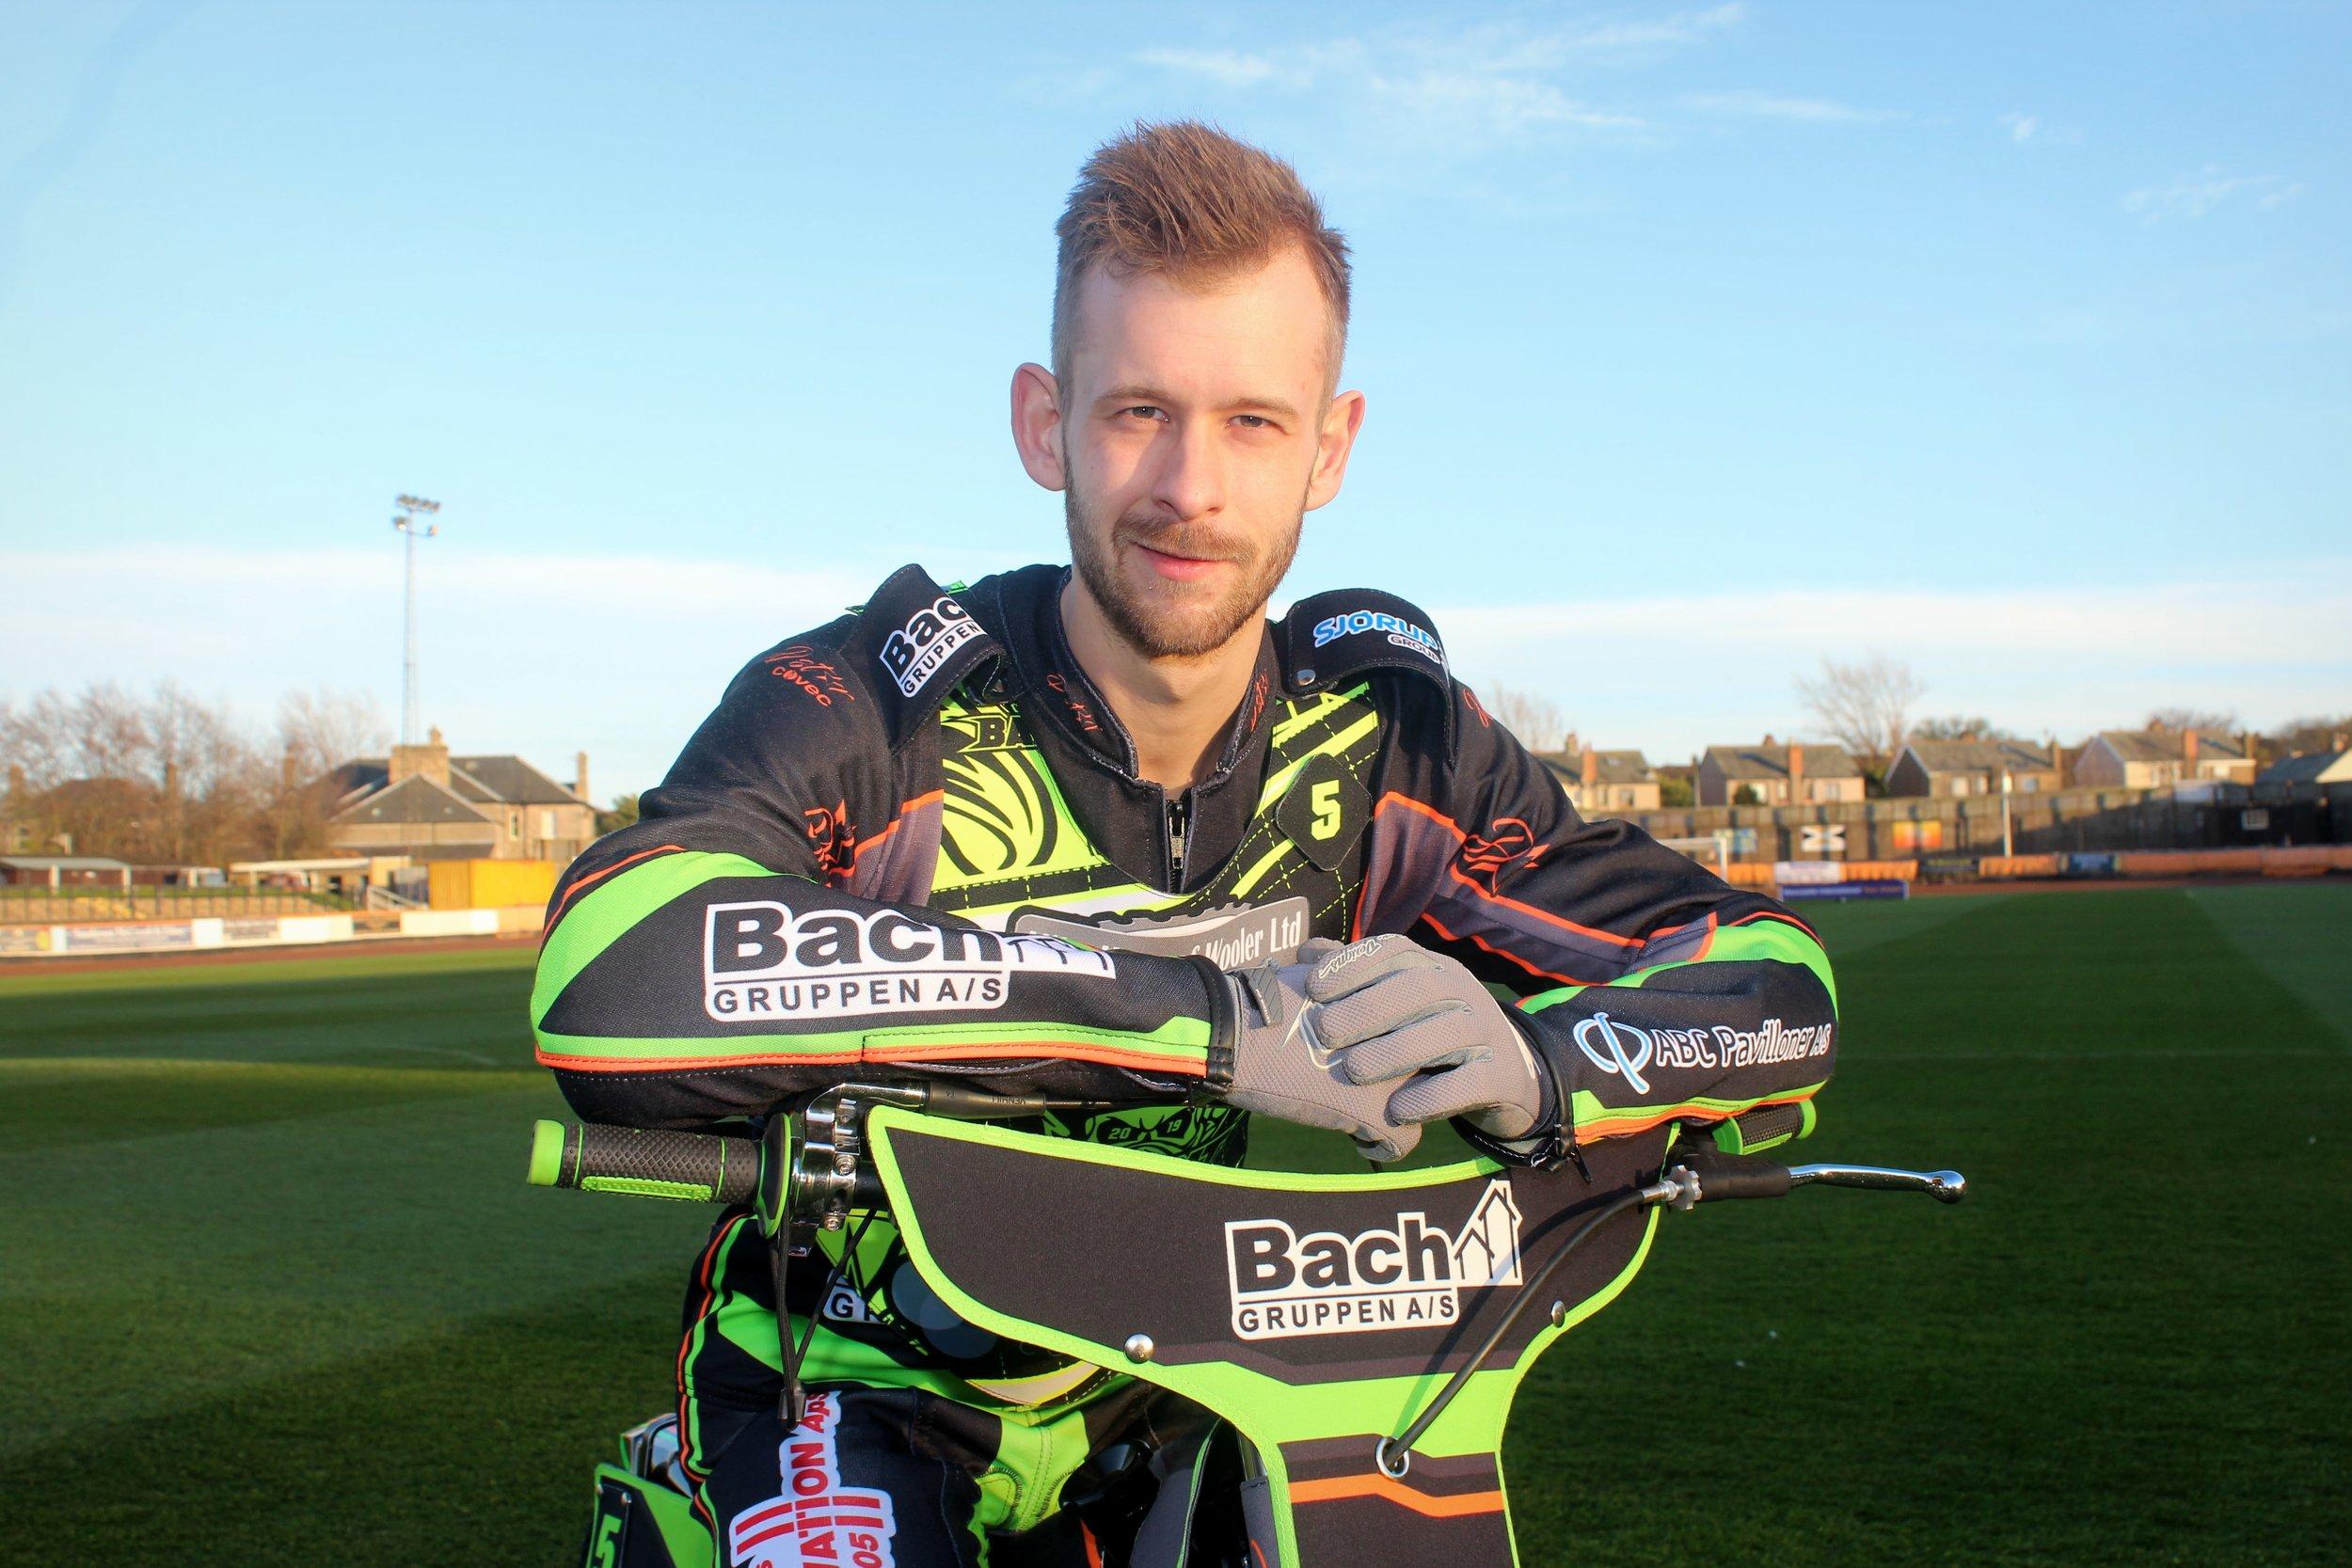 Nikolaj Busk Jacobsen replaces Tero Aarnio in the Aces side